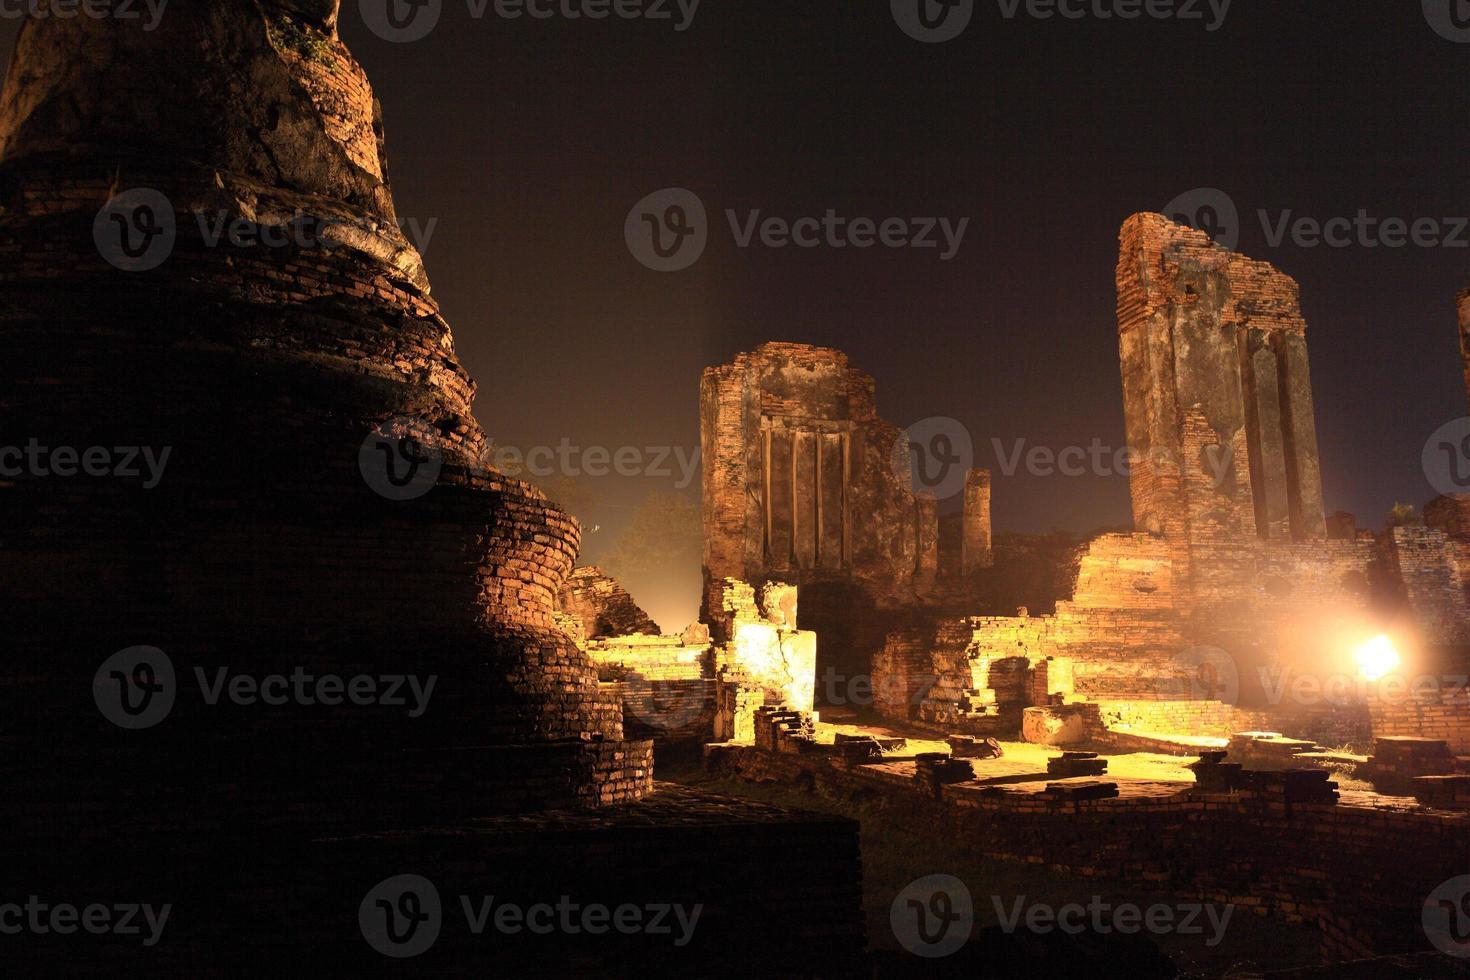 wat phra si sanphet - thailandia foto